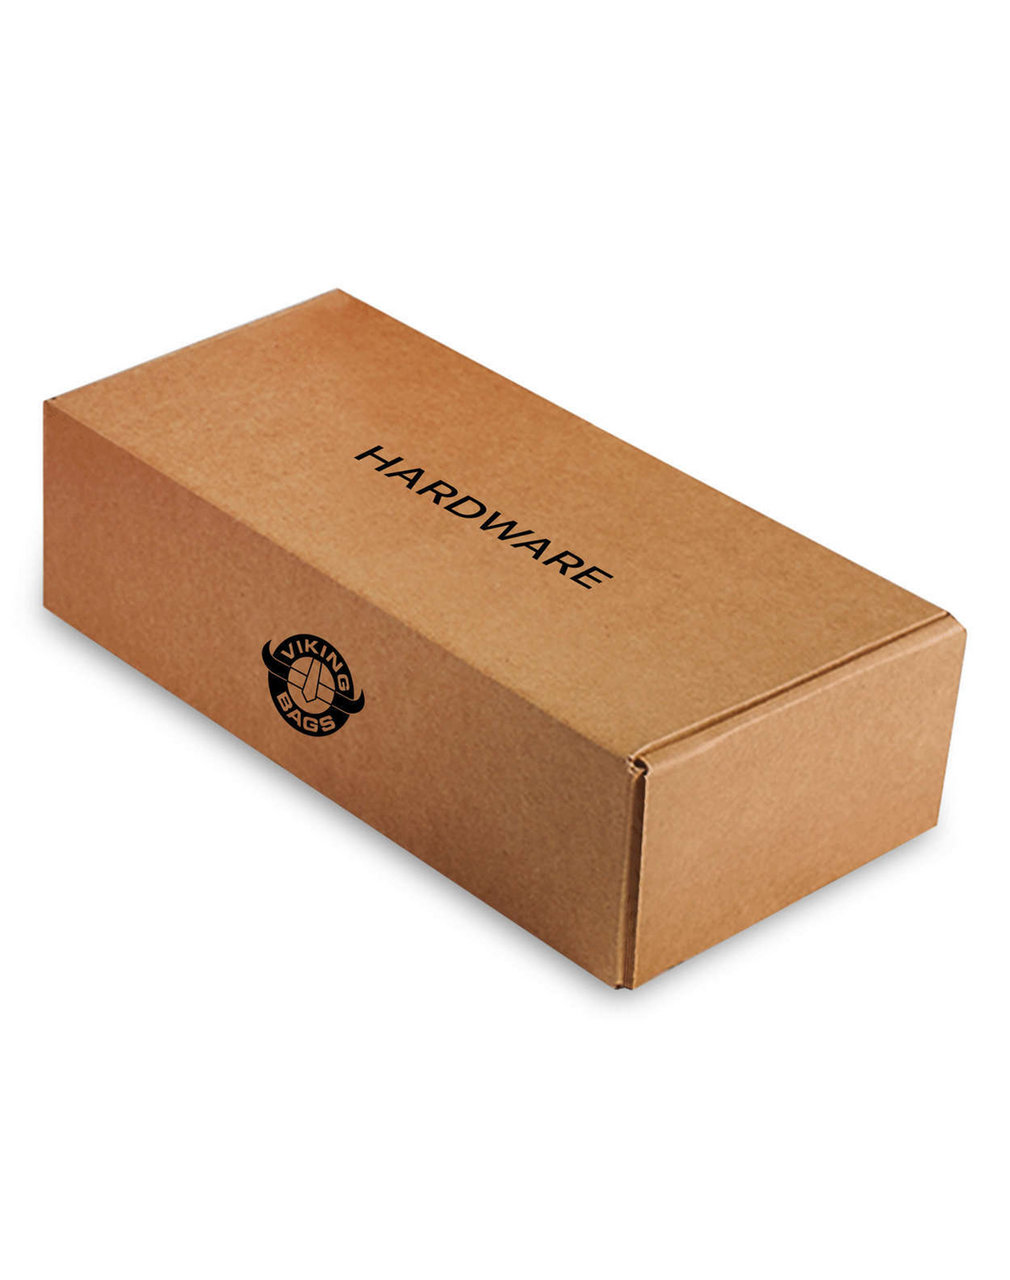 Honda VTX 1800 C Warrior Medium Motorcycle Saddlebags Box